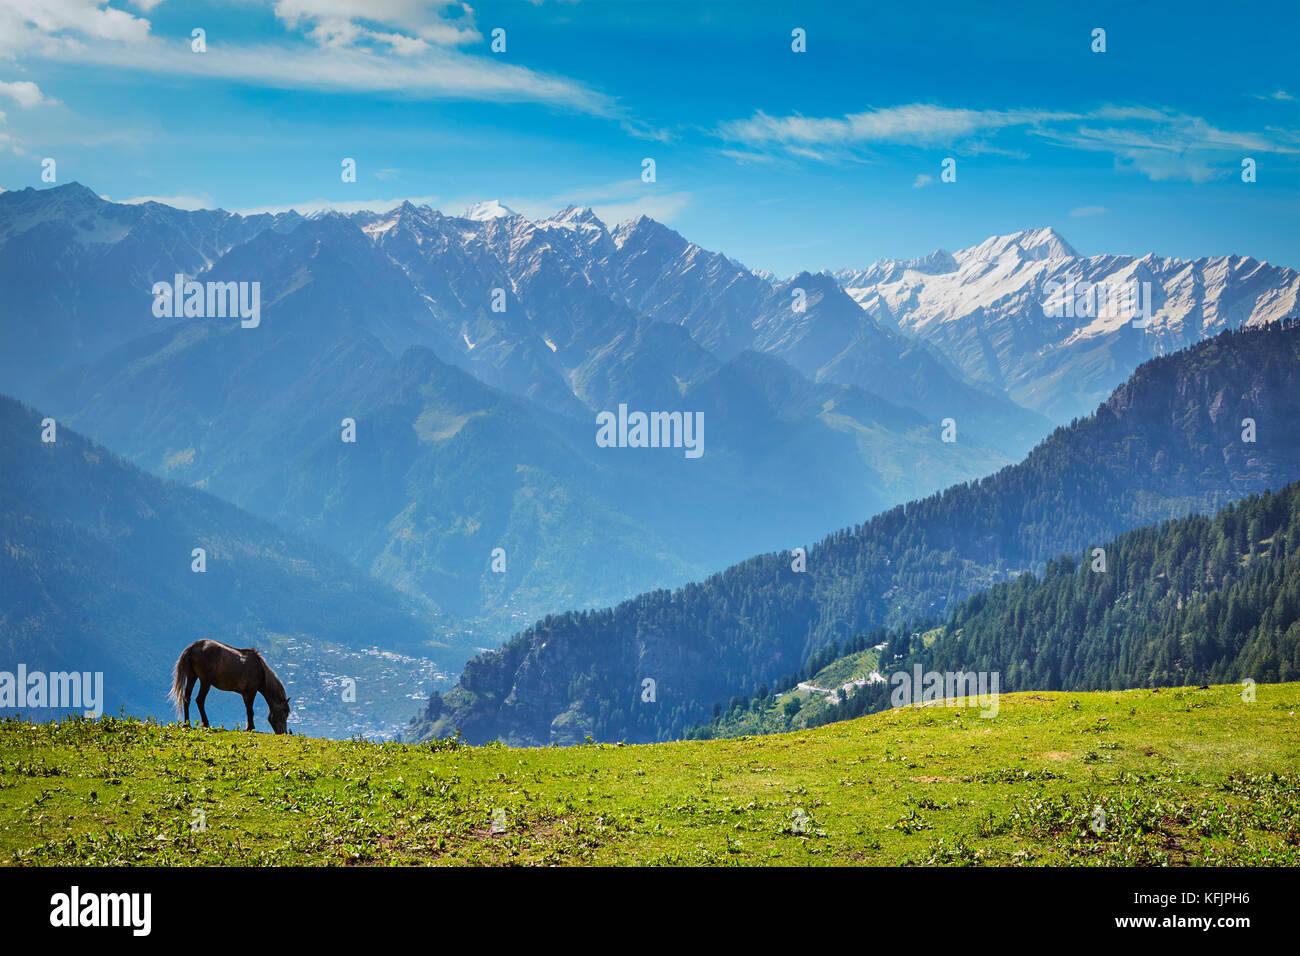 Horse in mountains. Himachal Pradesh, India - Stock Image